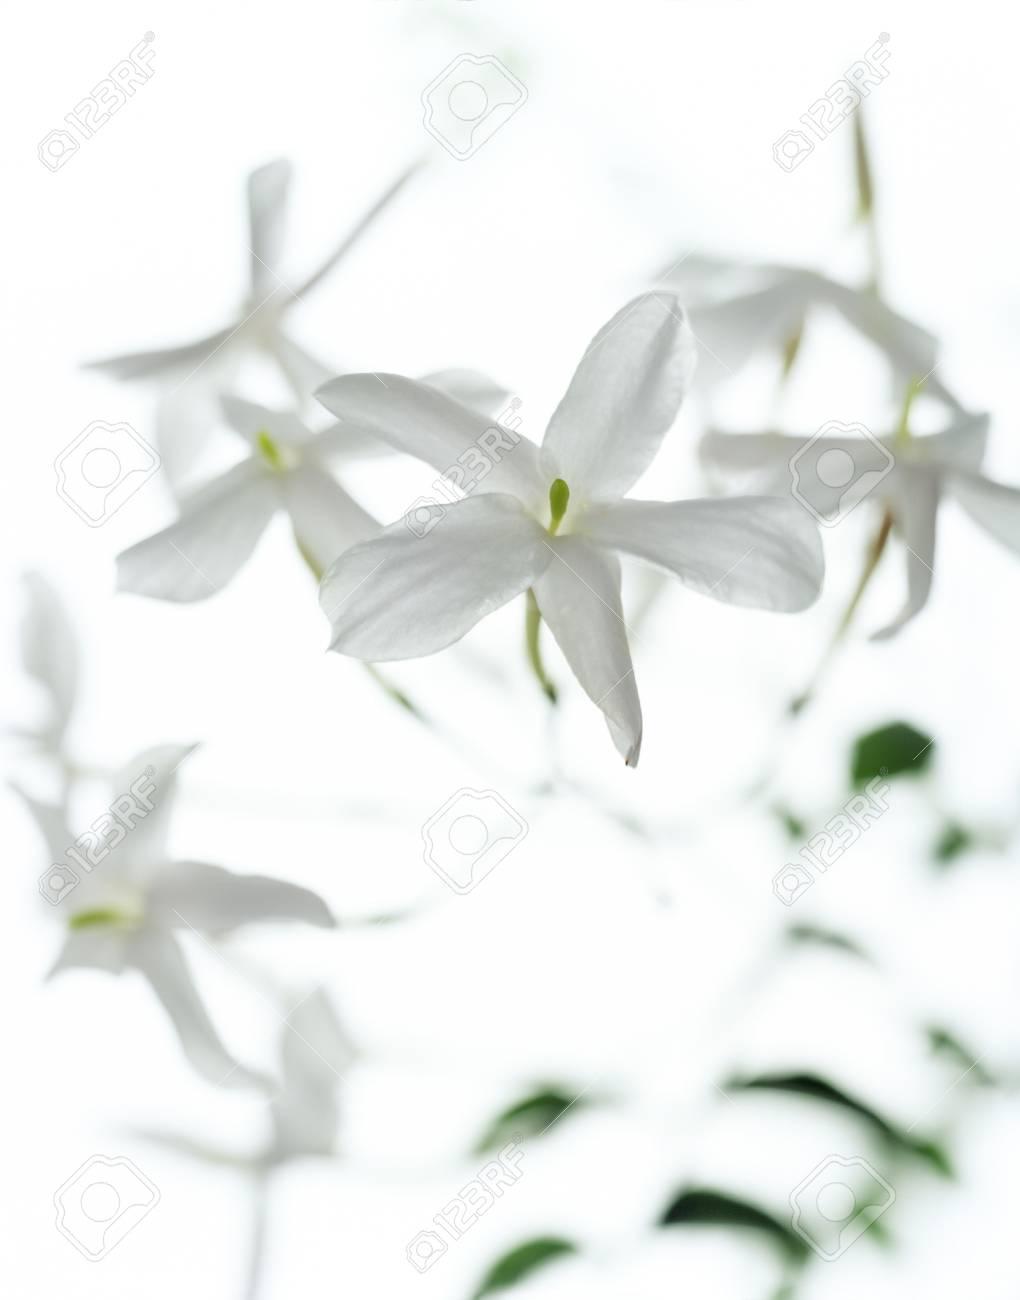 Jasmine flowers family oleaceae stock photo picture and royalty jasmine flowers family oleaceae stock photo 77541243 izmirmasajfo Gallery